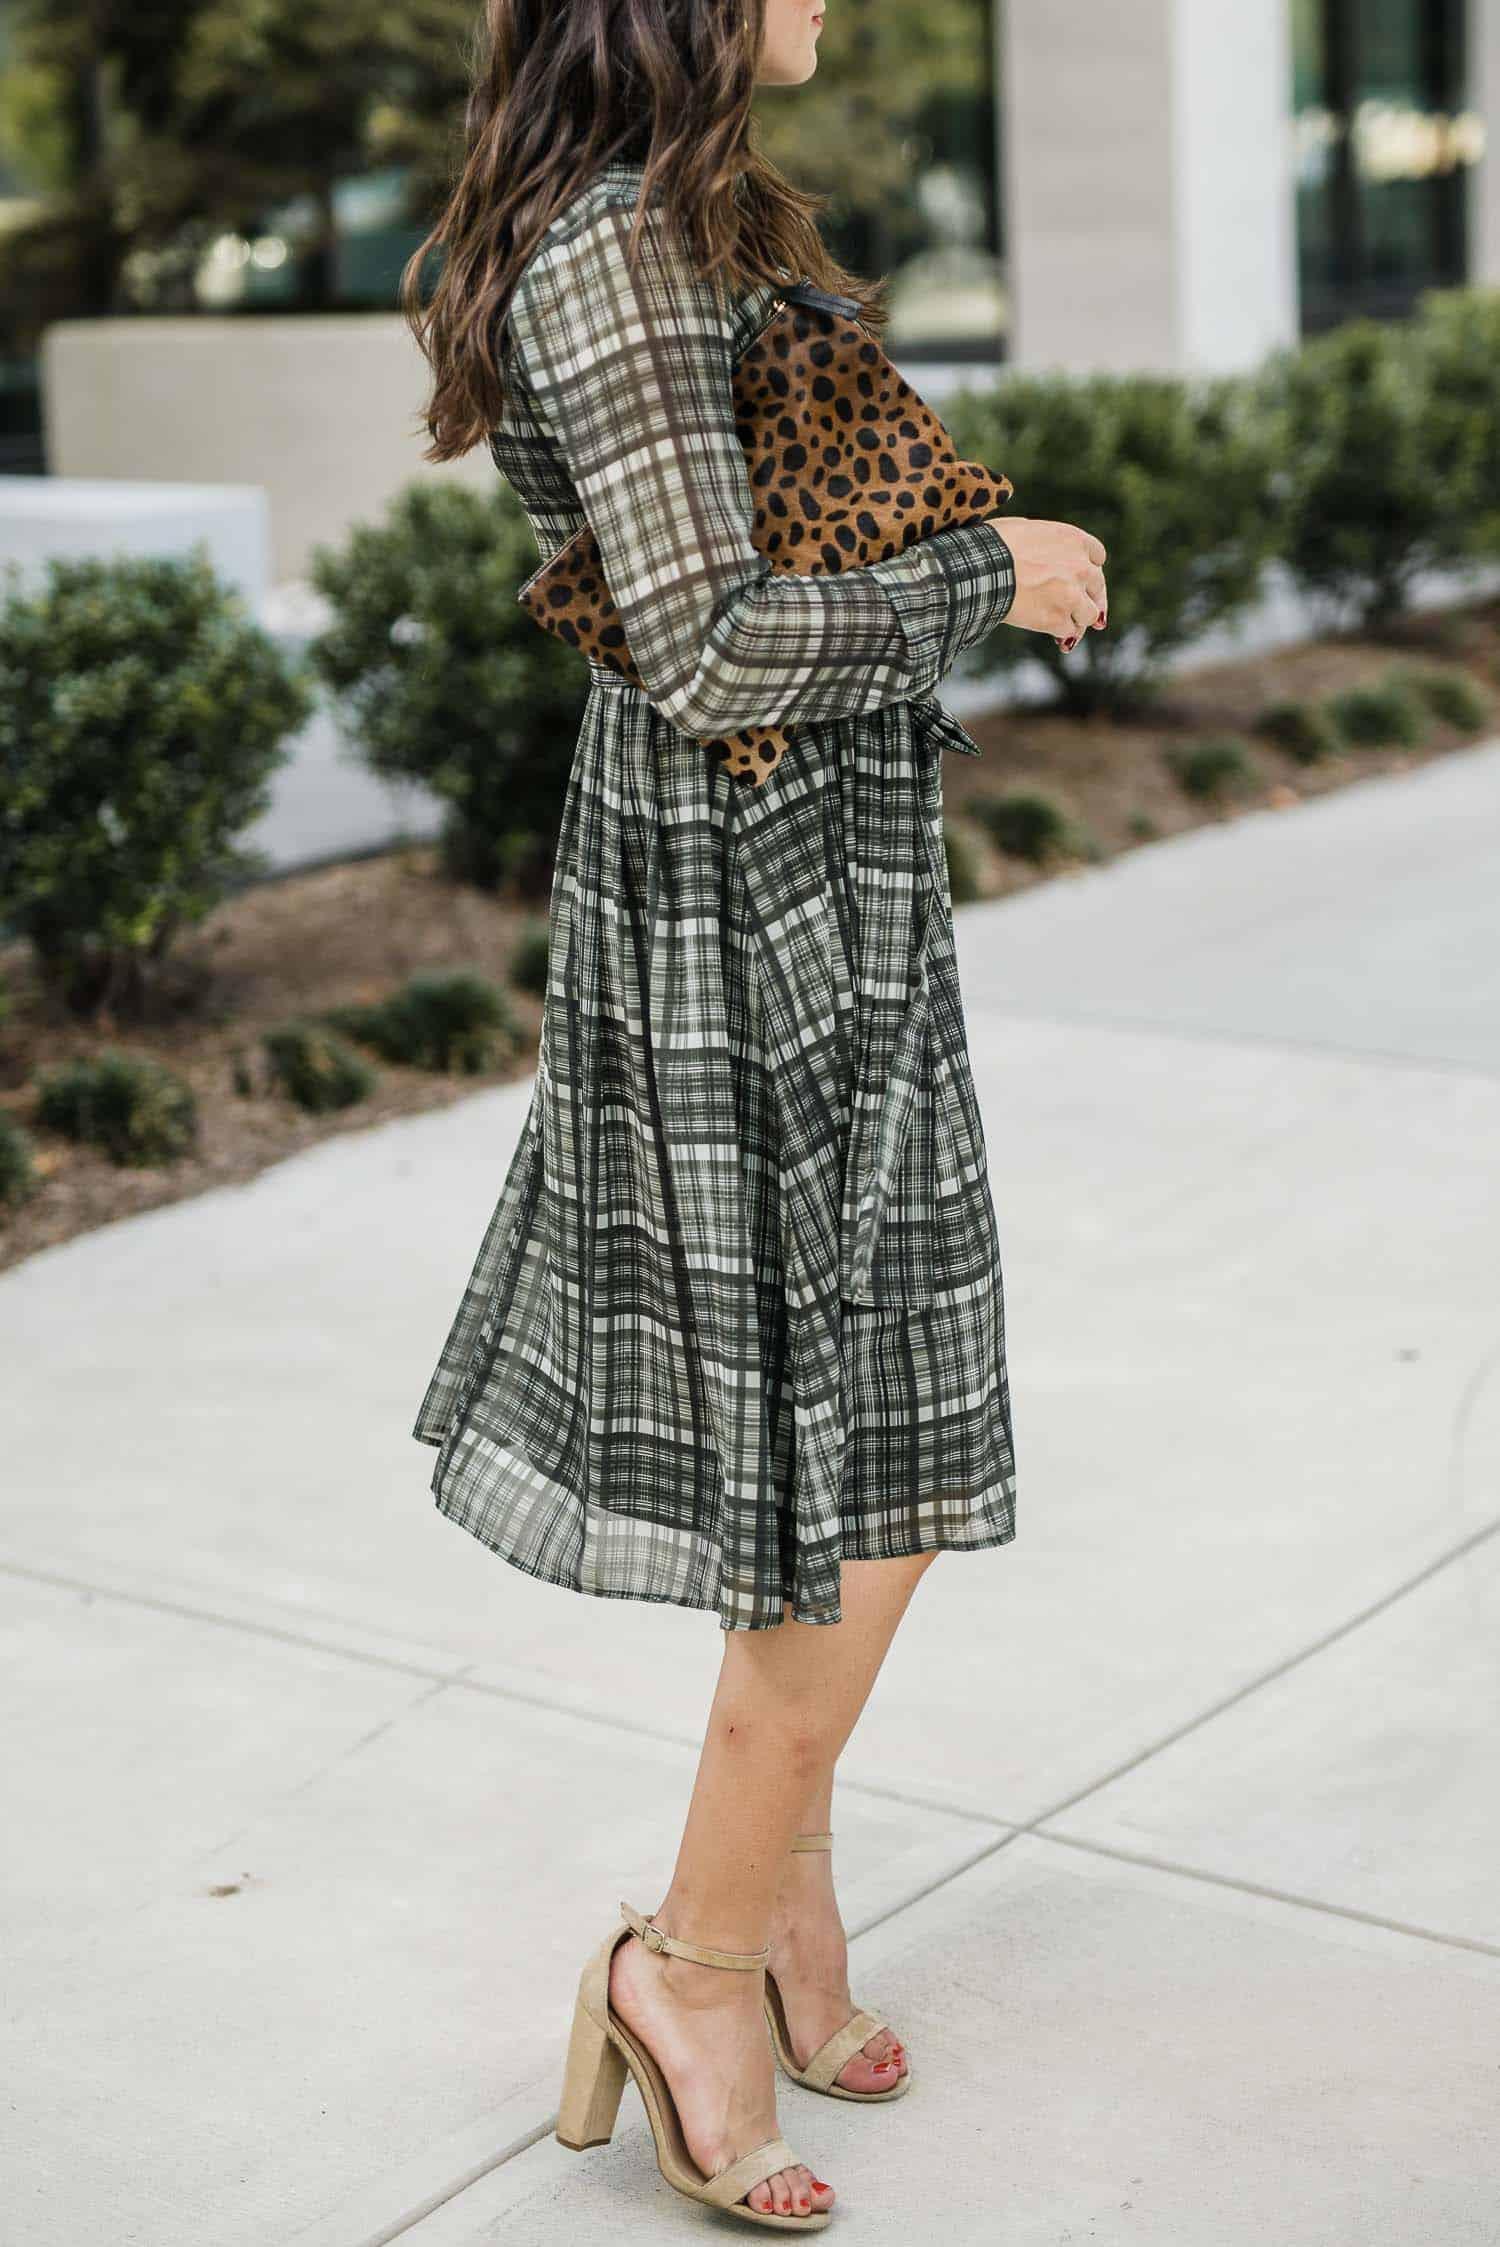 Gal Meets Glam Jessie Dress - My Style Vita